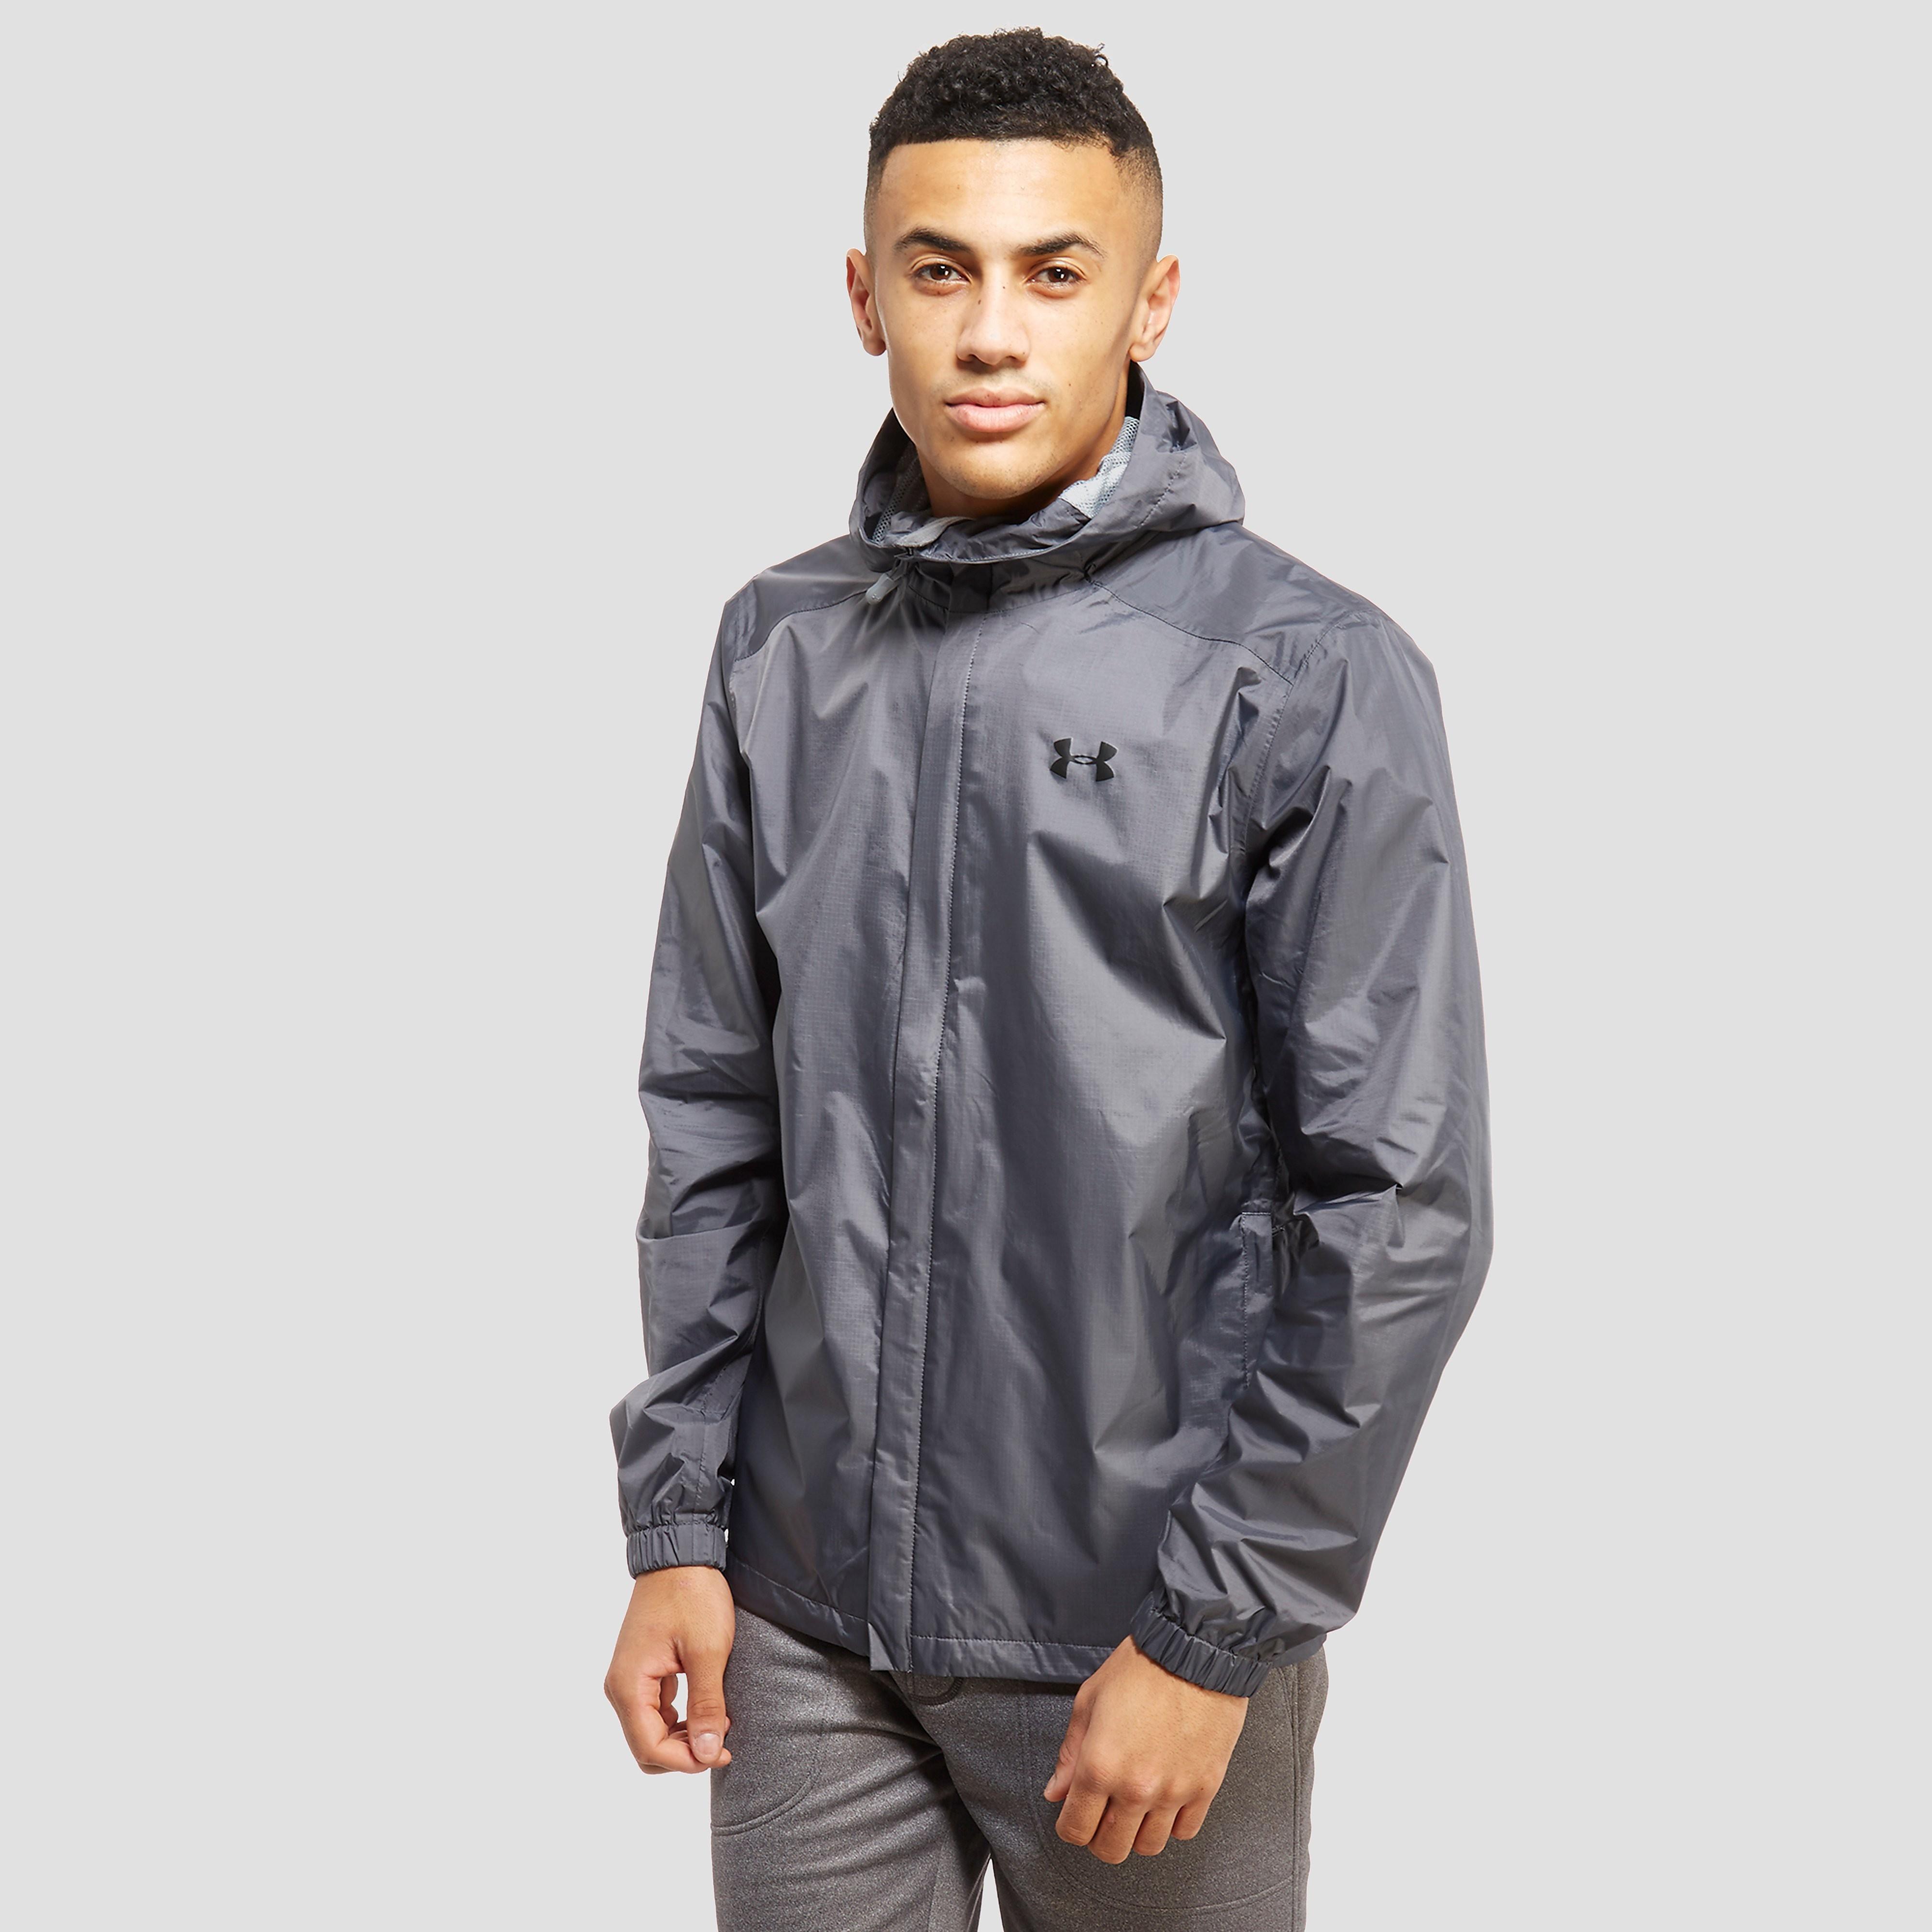 Under Armour Bora Men's Jacket